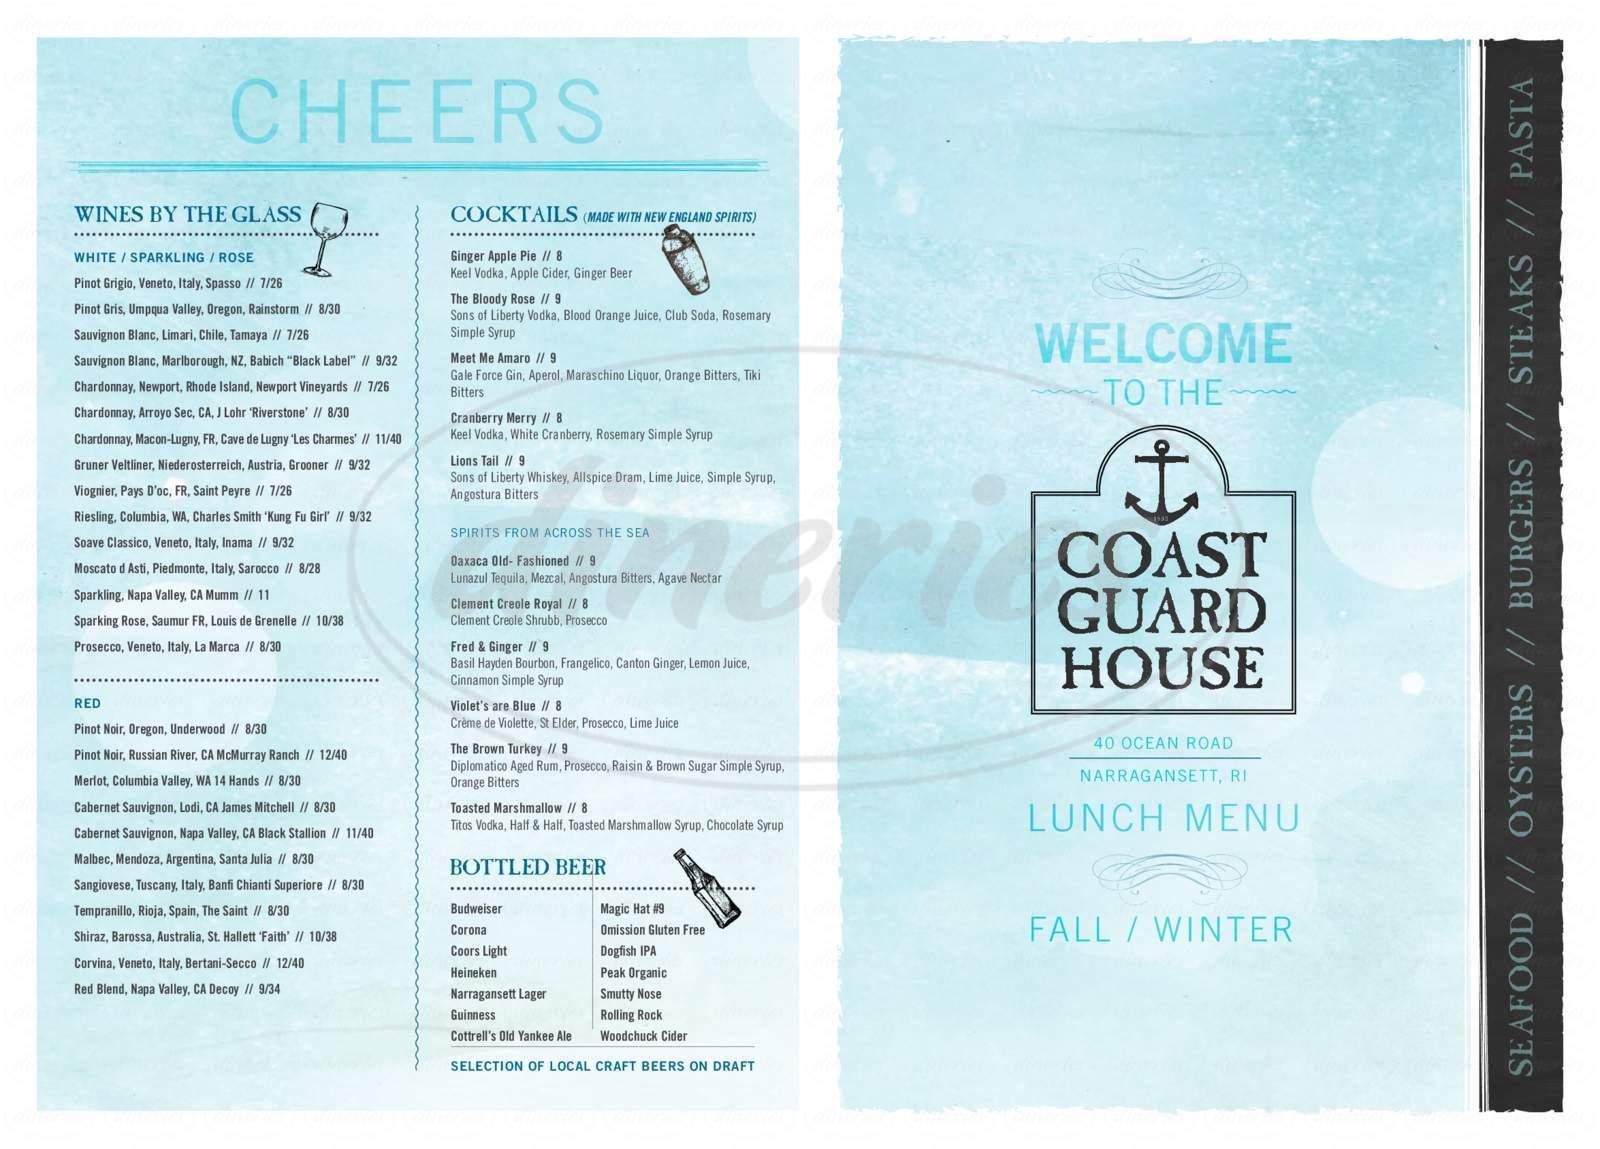 Coast Guard House Menu - Narragansett - Dineries